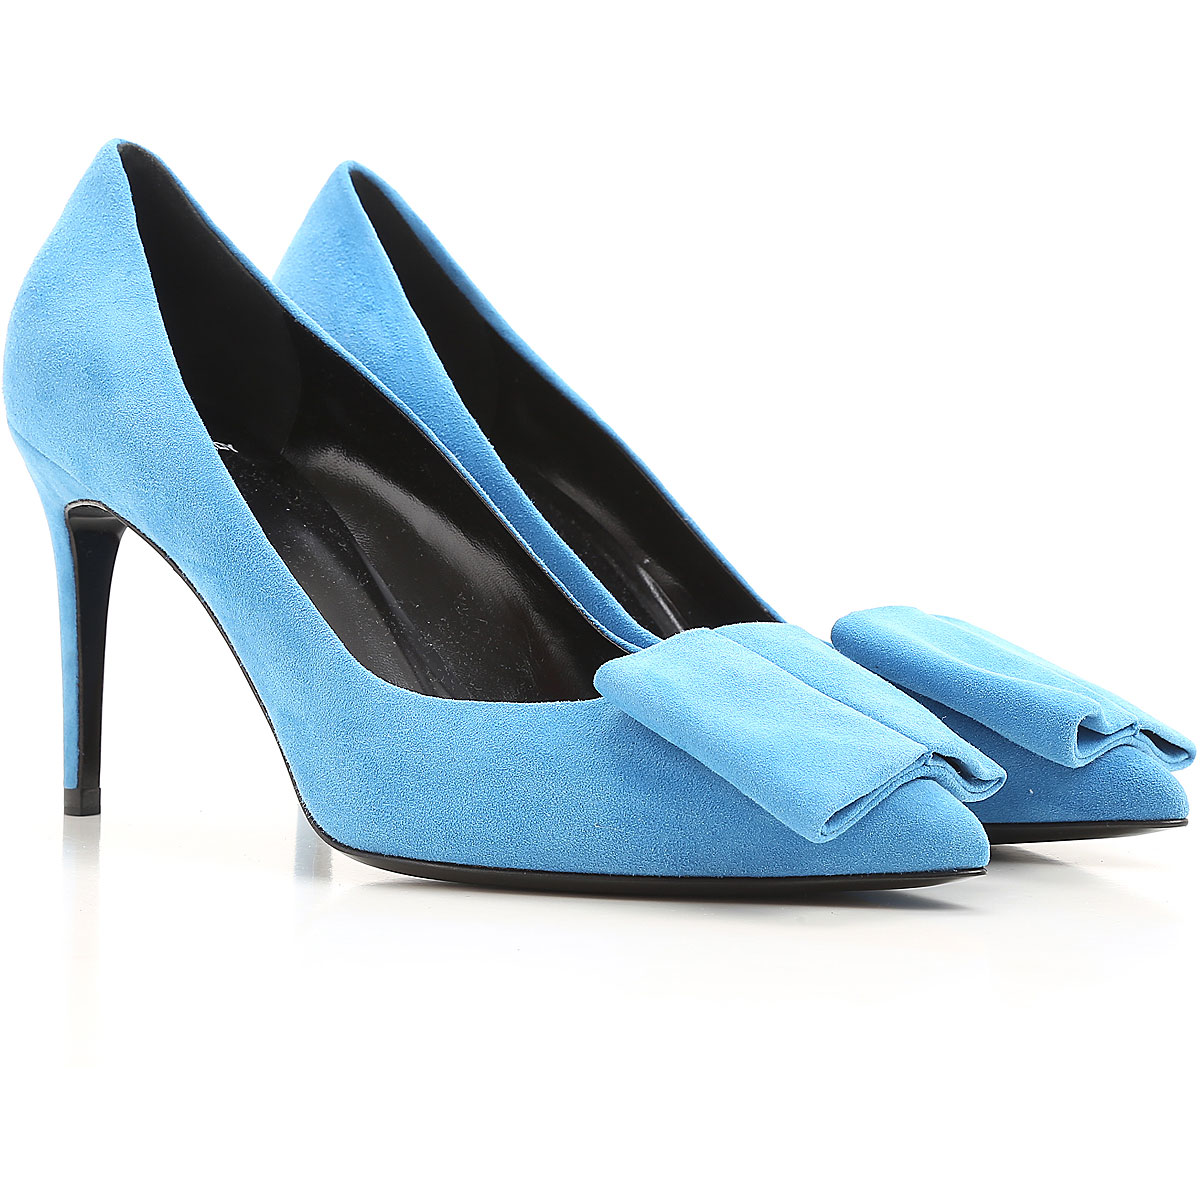 chaussures femme pierre hardy code produit ml07 0bi pump80. Black Bedroom Furniture Sets. Home Design Ideas